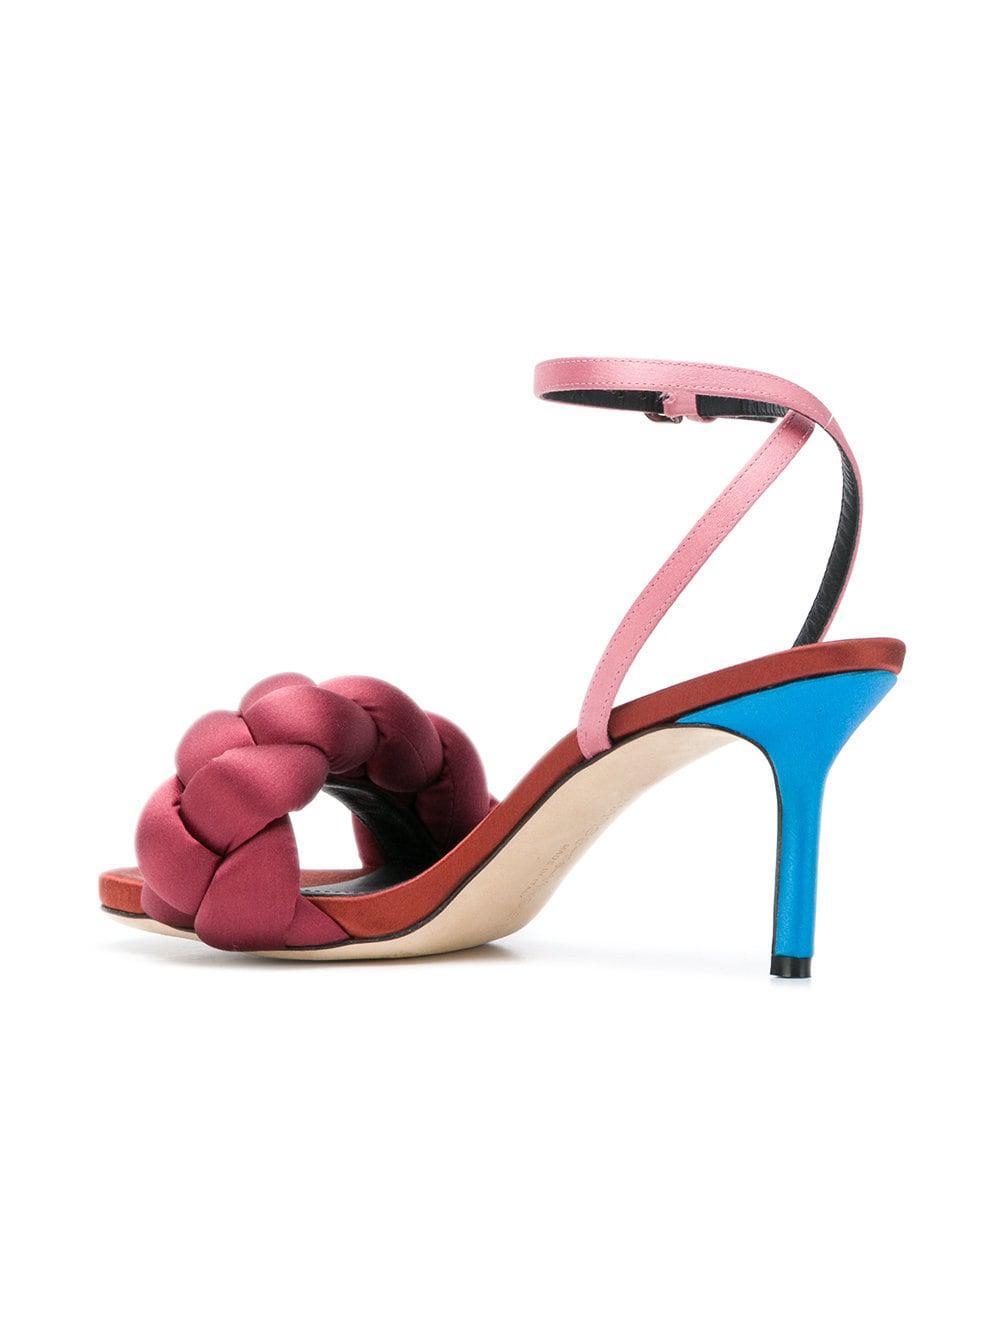 c045324caebc7e Marco De Vincenzo - Pink Braided Strap Sandals - Lyst. View fullscreen